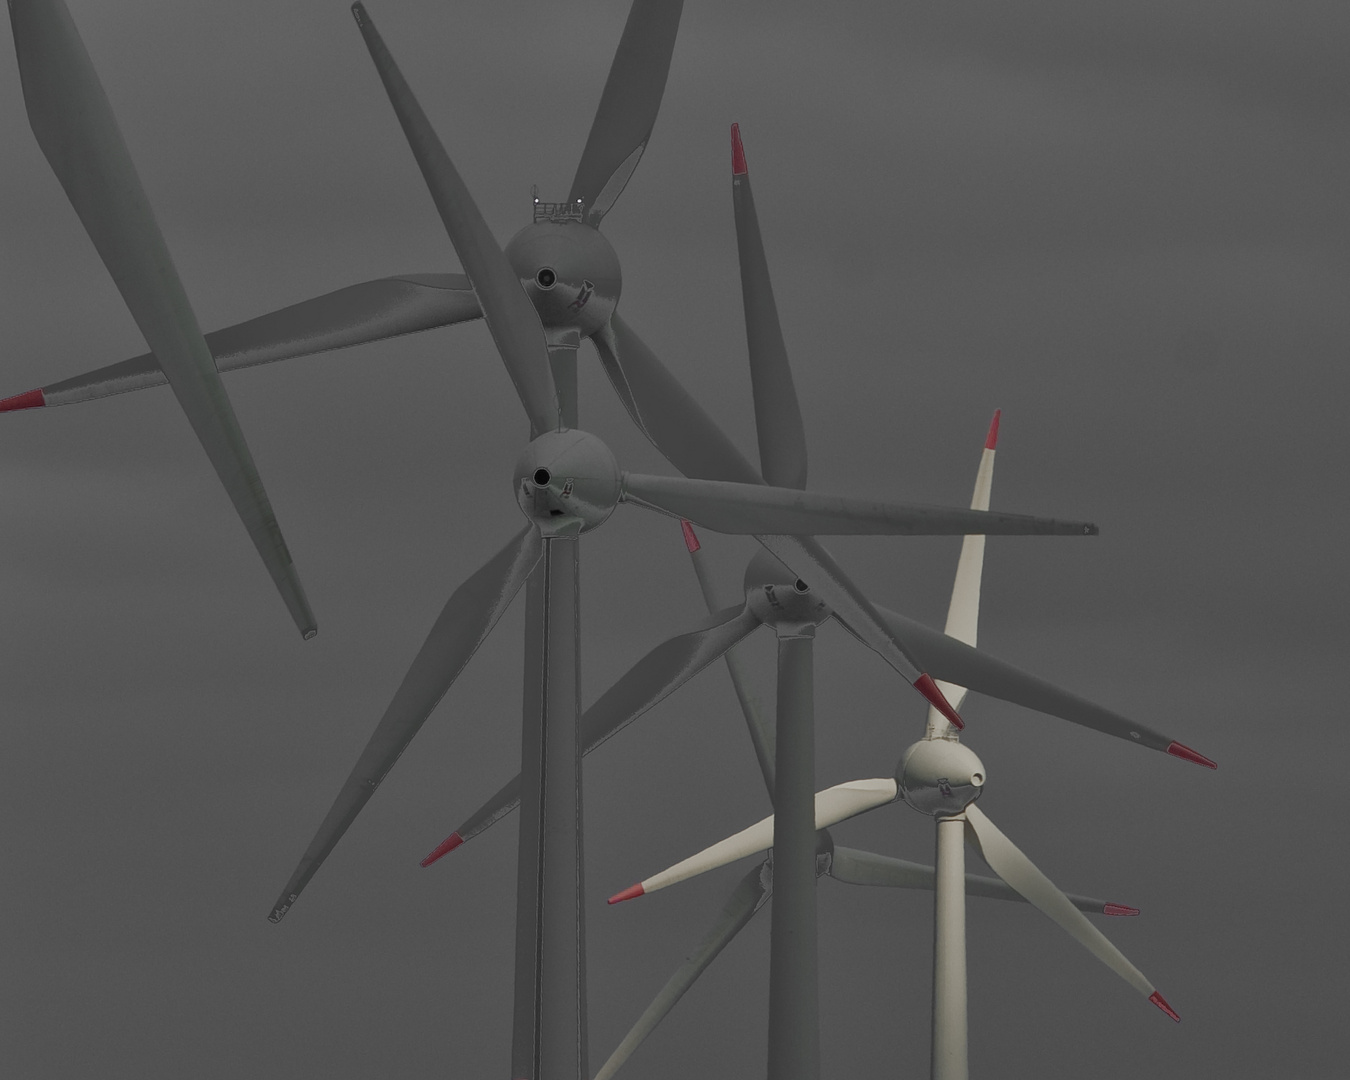 Wind = Strom?!